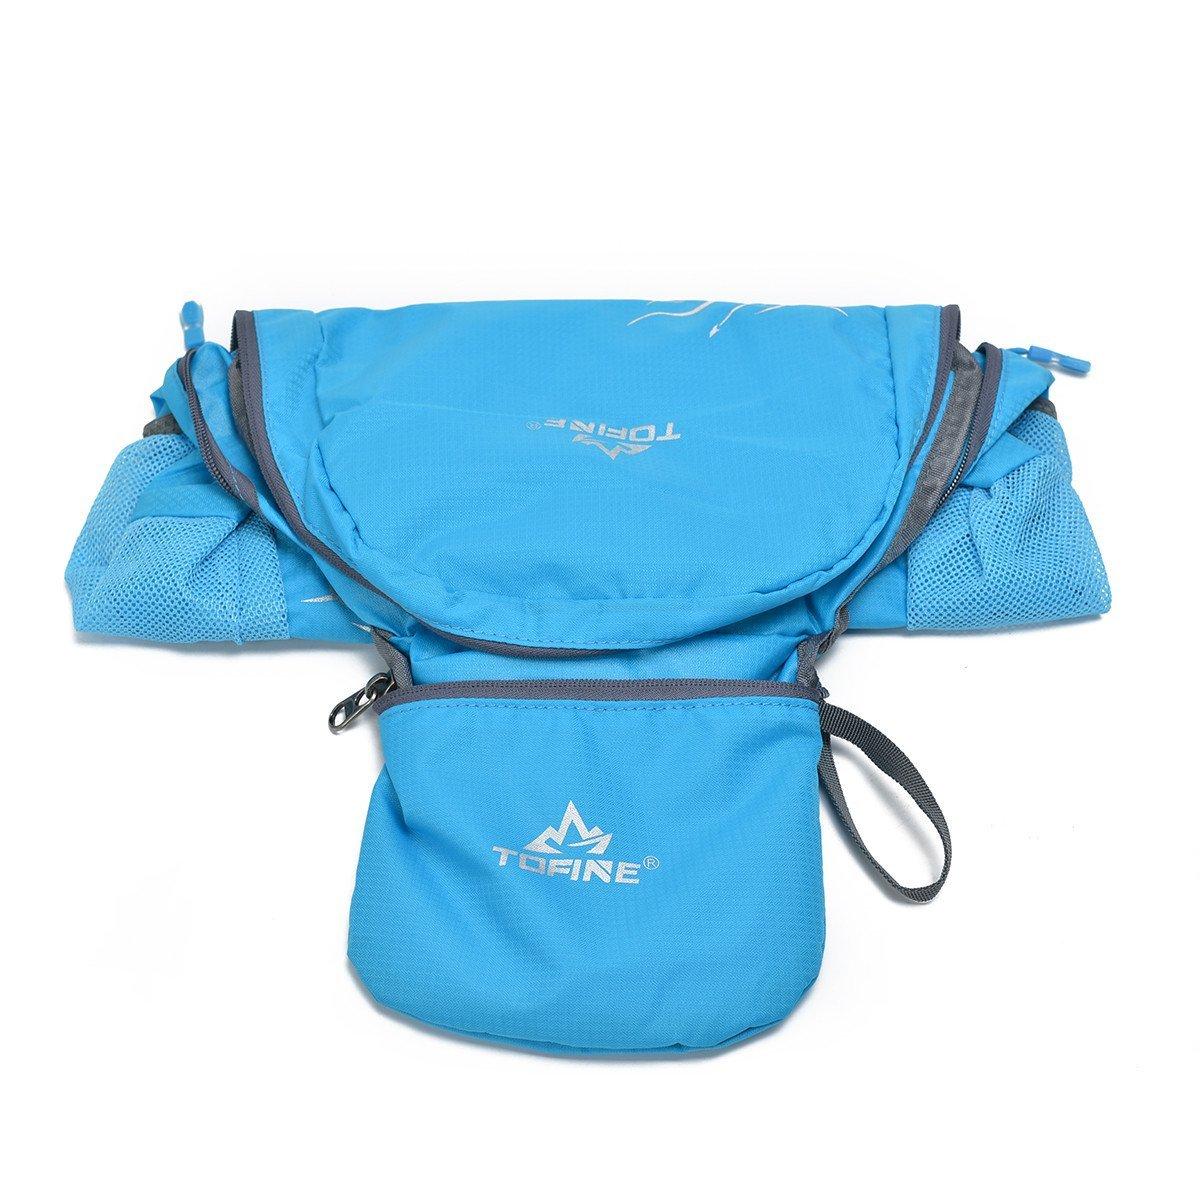 Tofine Packable Backpack Waterproof Hiking Daypack Womens Light Blue 15L